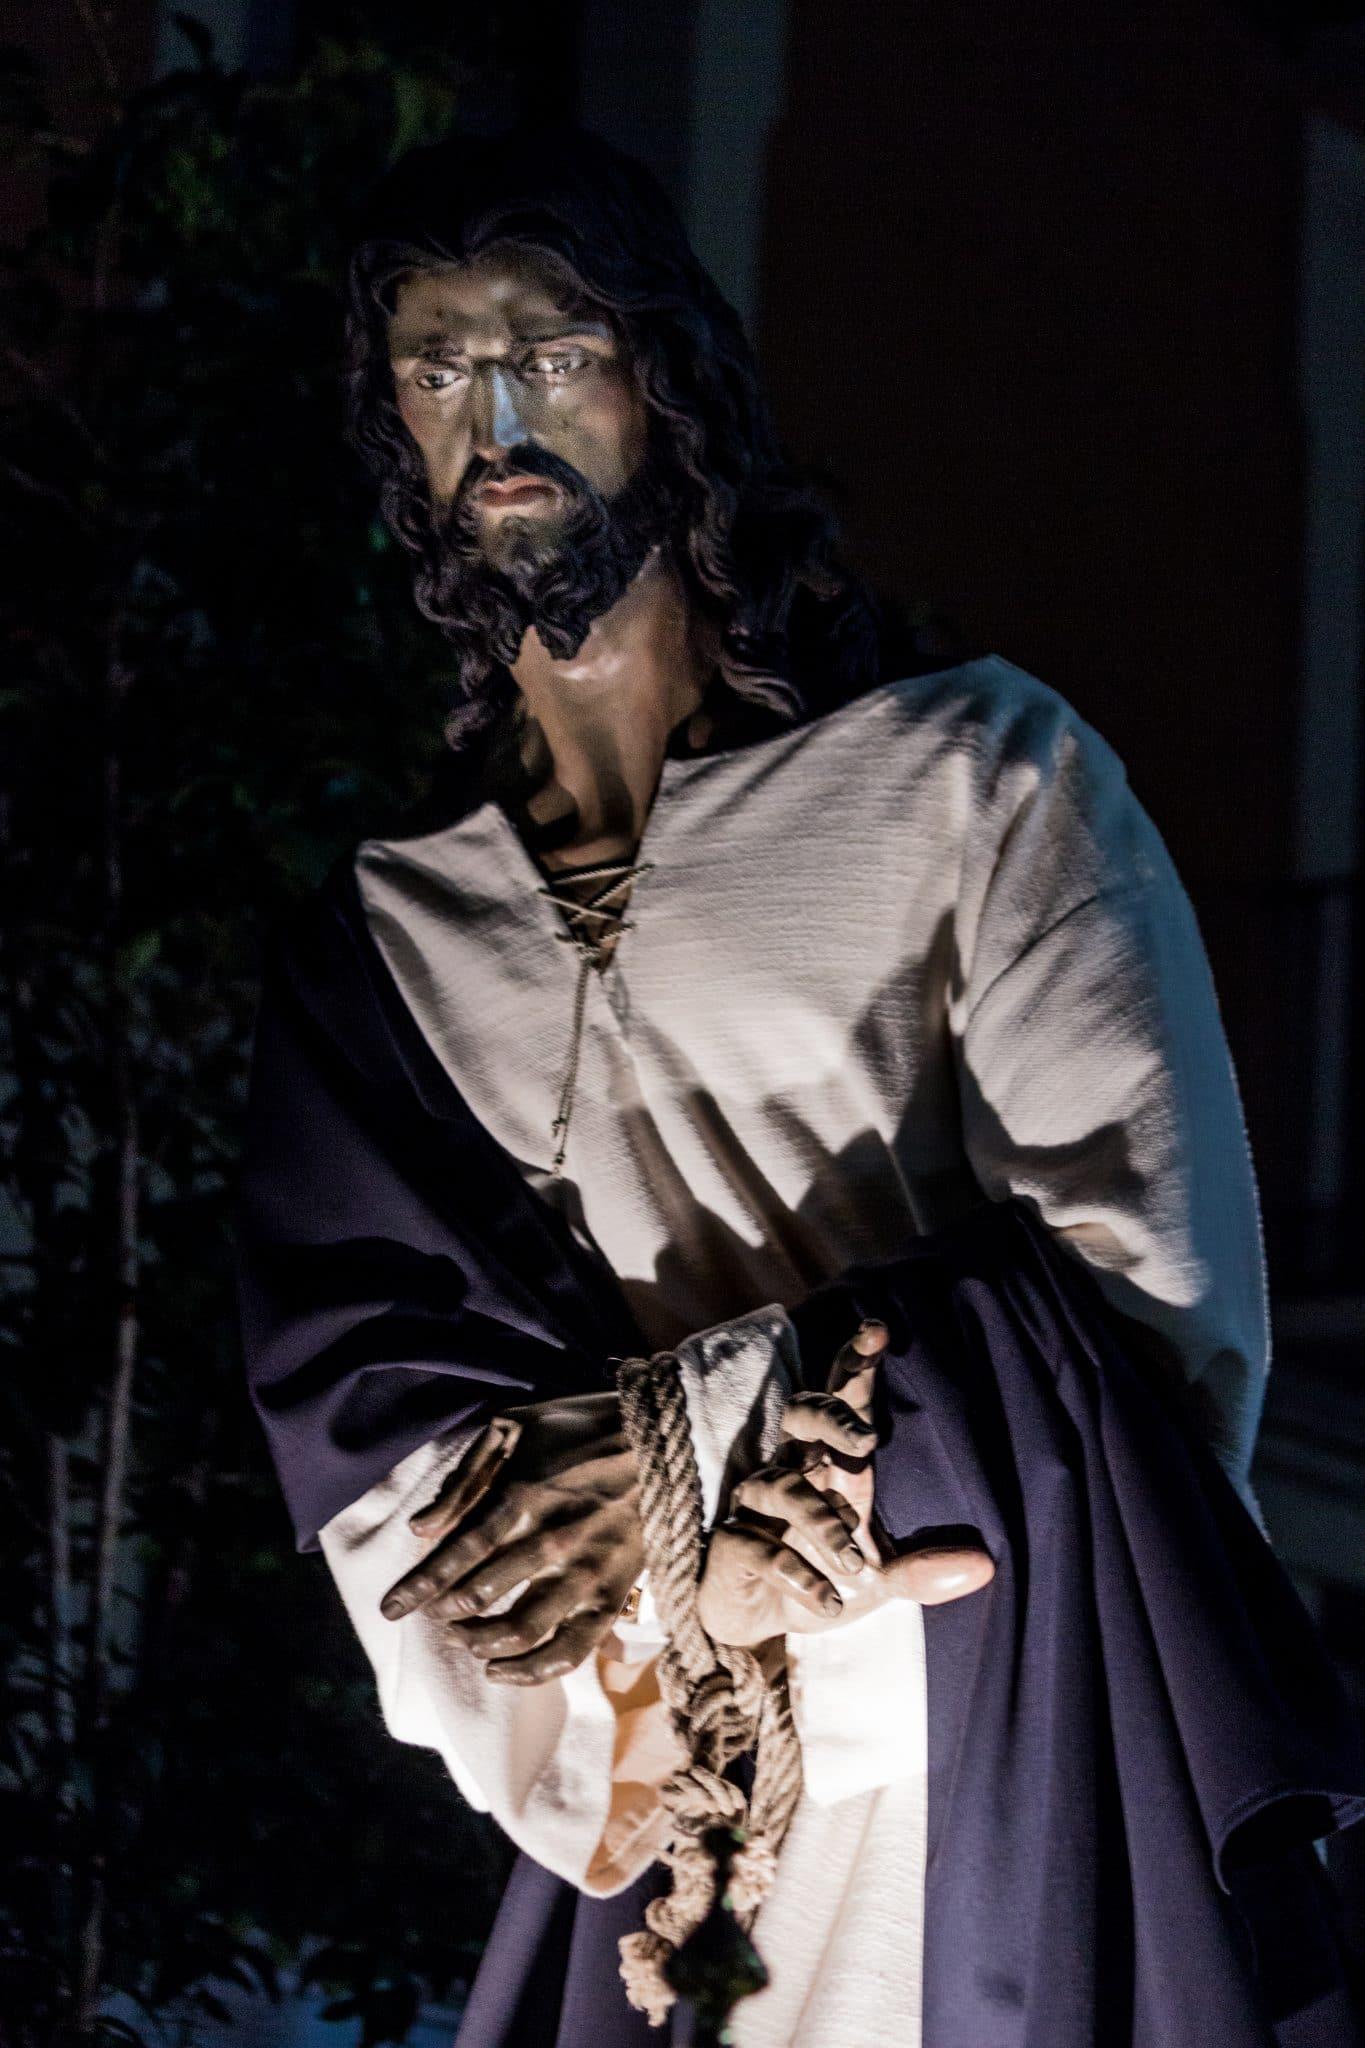 Semana Santa en Zaragoza - Procesion Titular Prendimiento